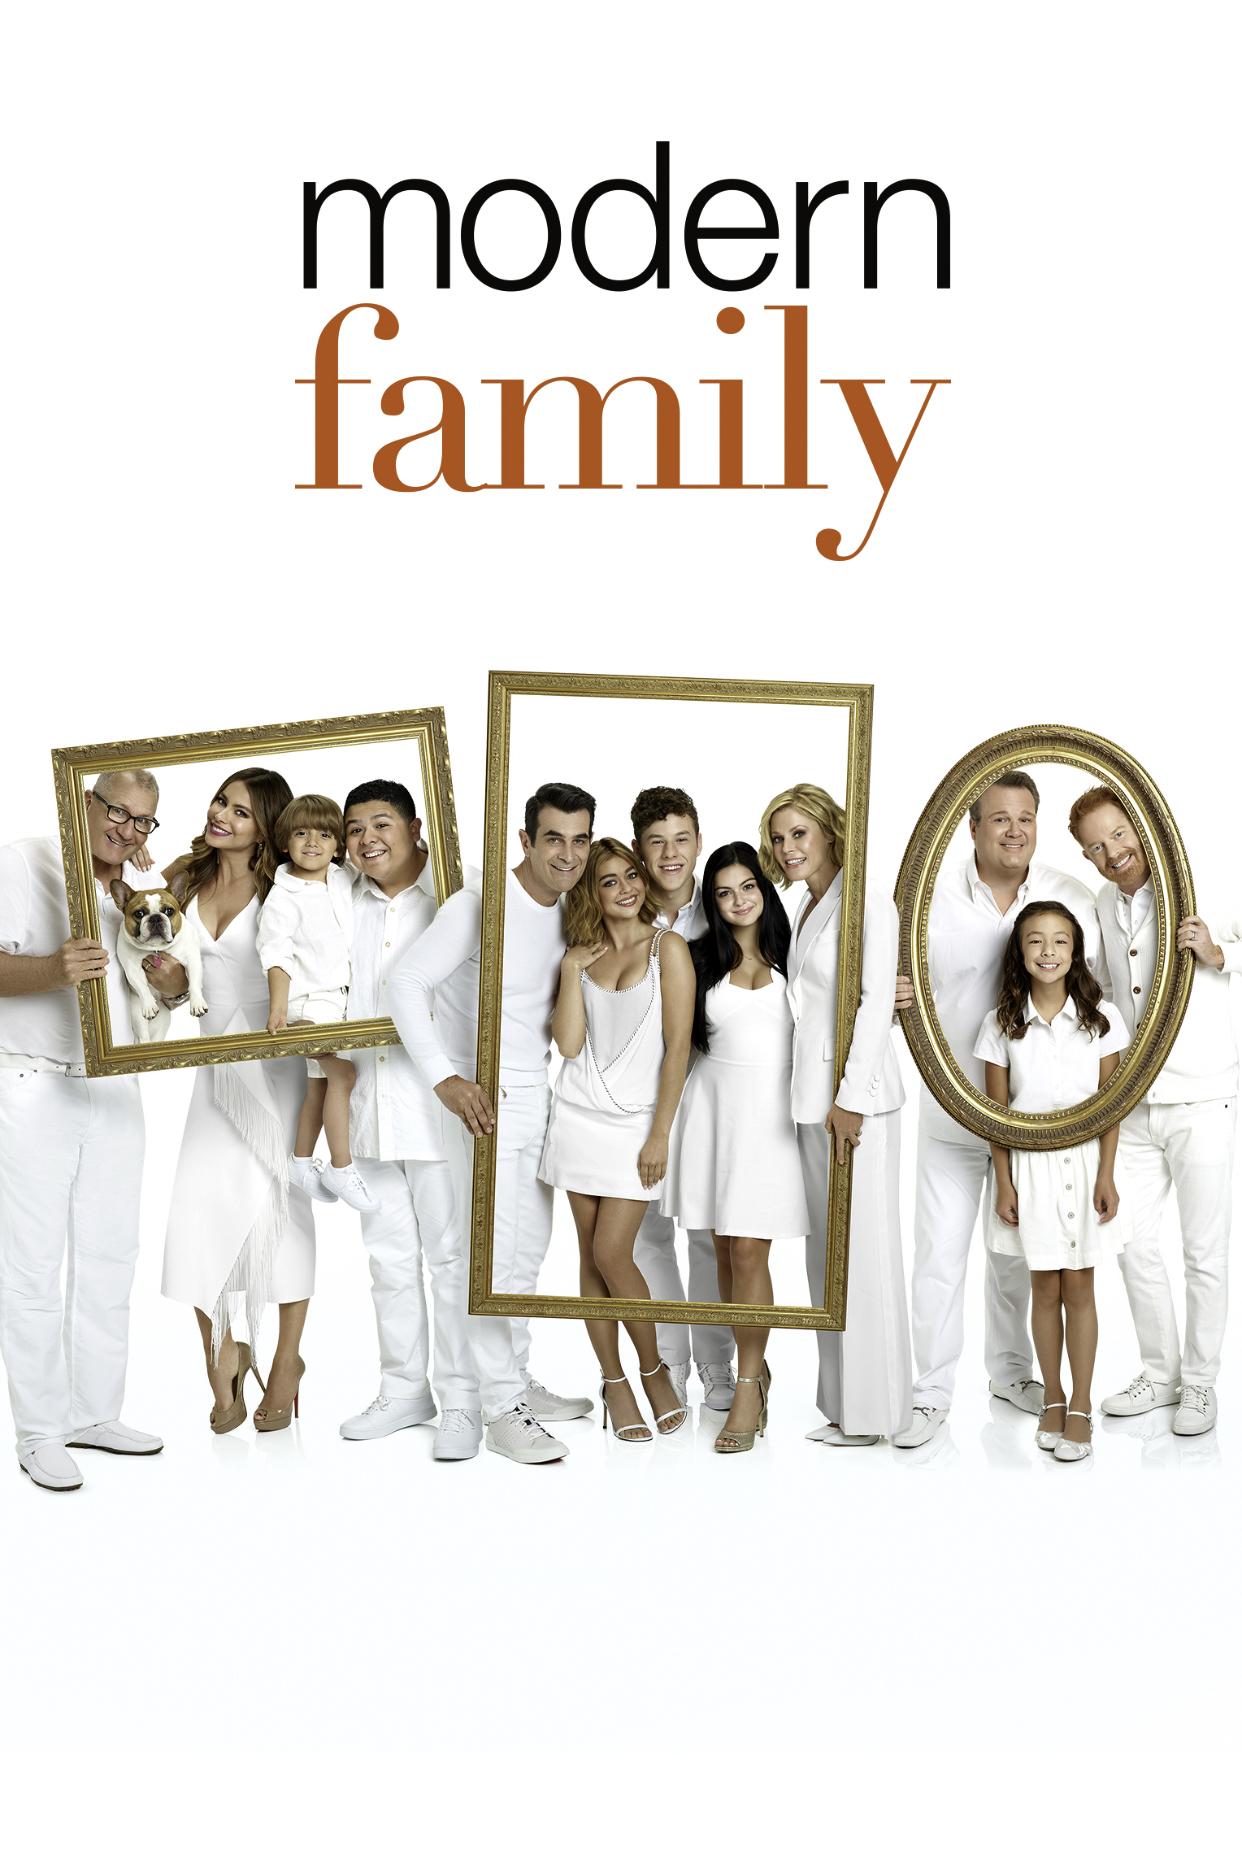 Modern Family - Edward Murphy